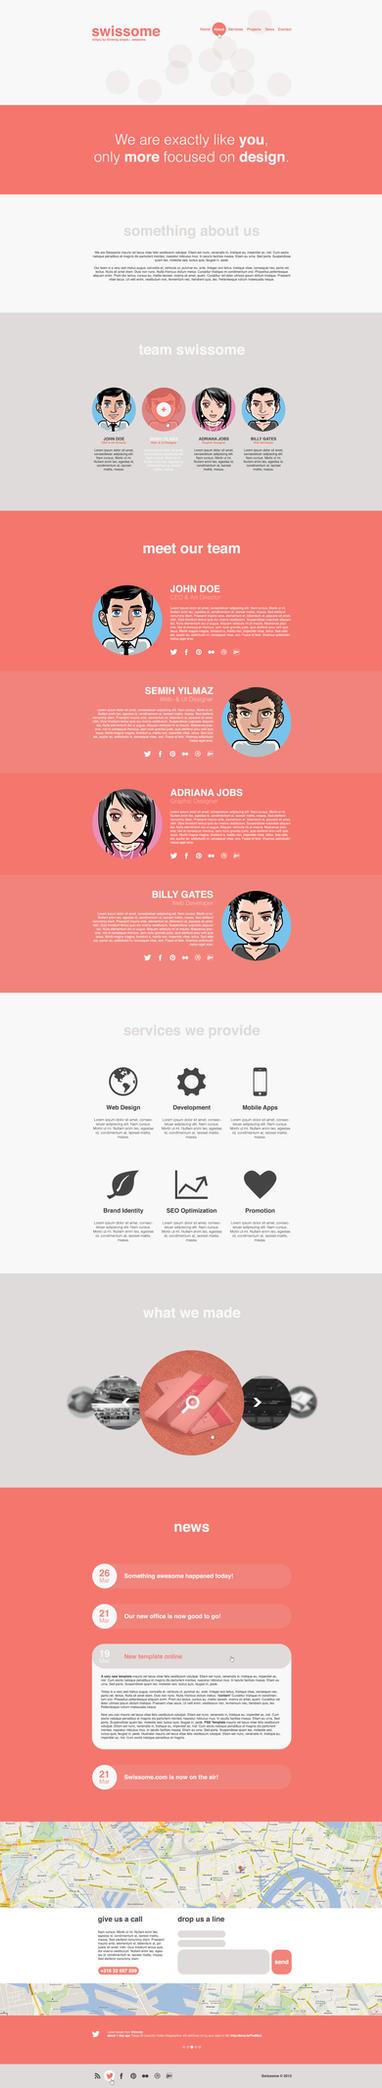 Swissome Web Design by SMHYLMZ